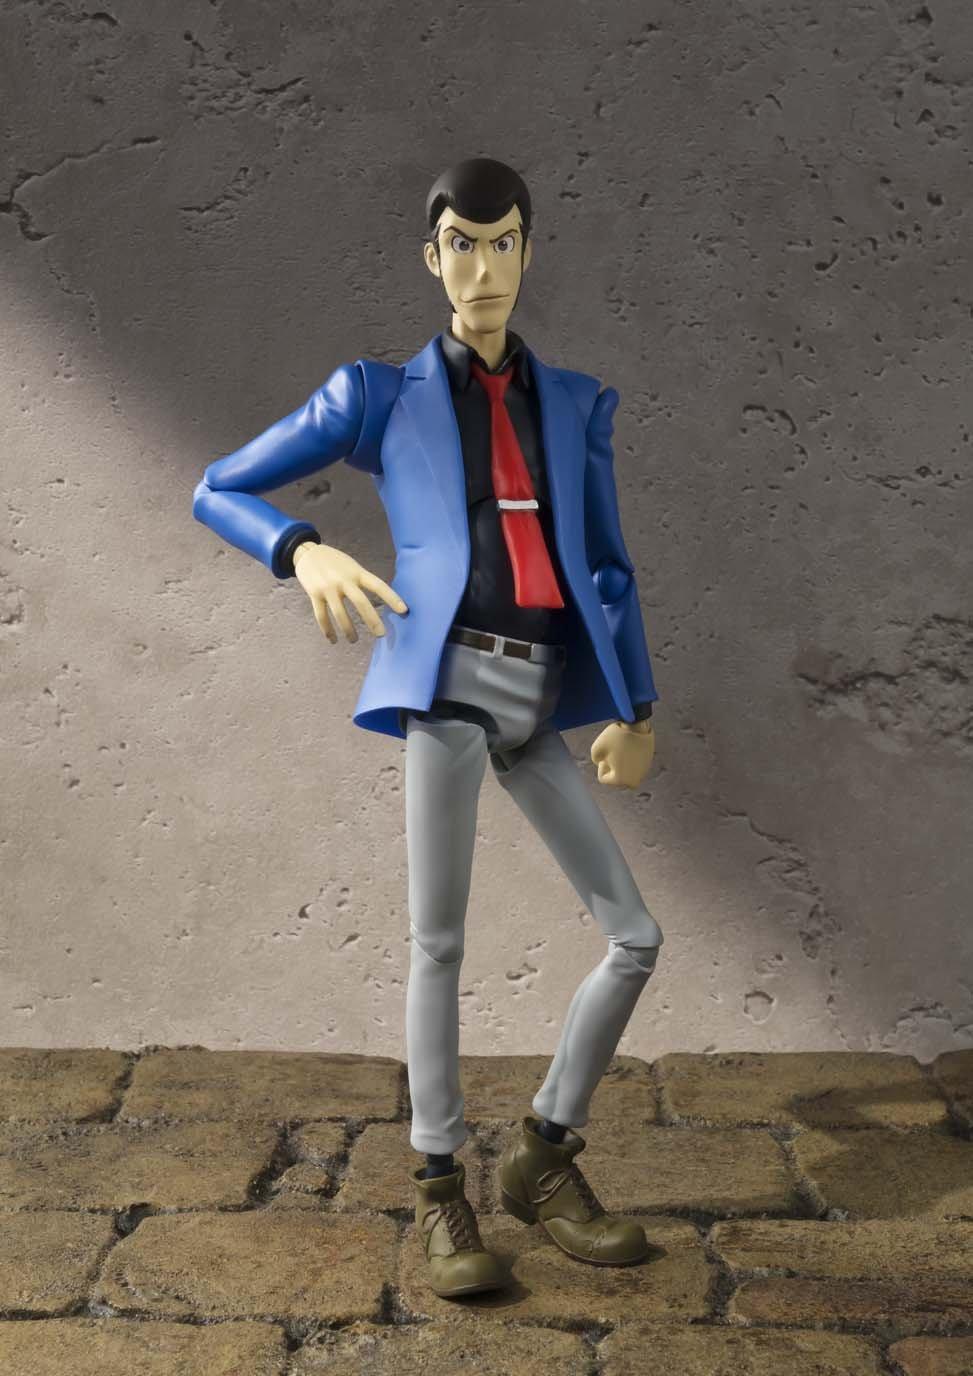 Tamashii Nations Bandai Lupin The Third Lupin The Third H Figuarts Action Figure